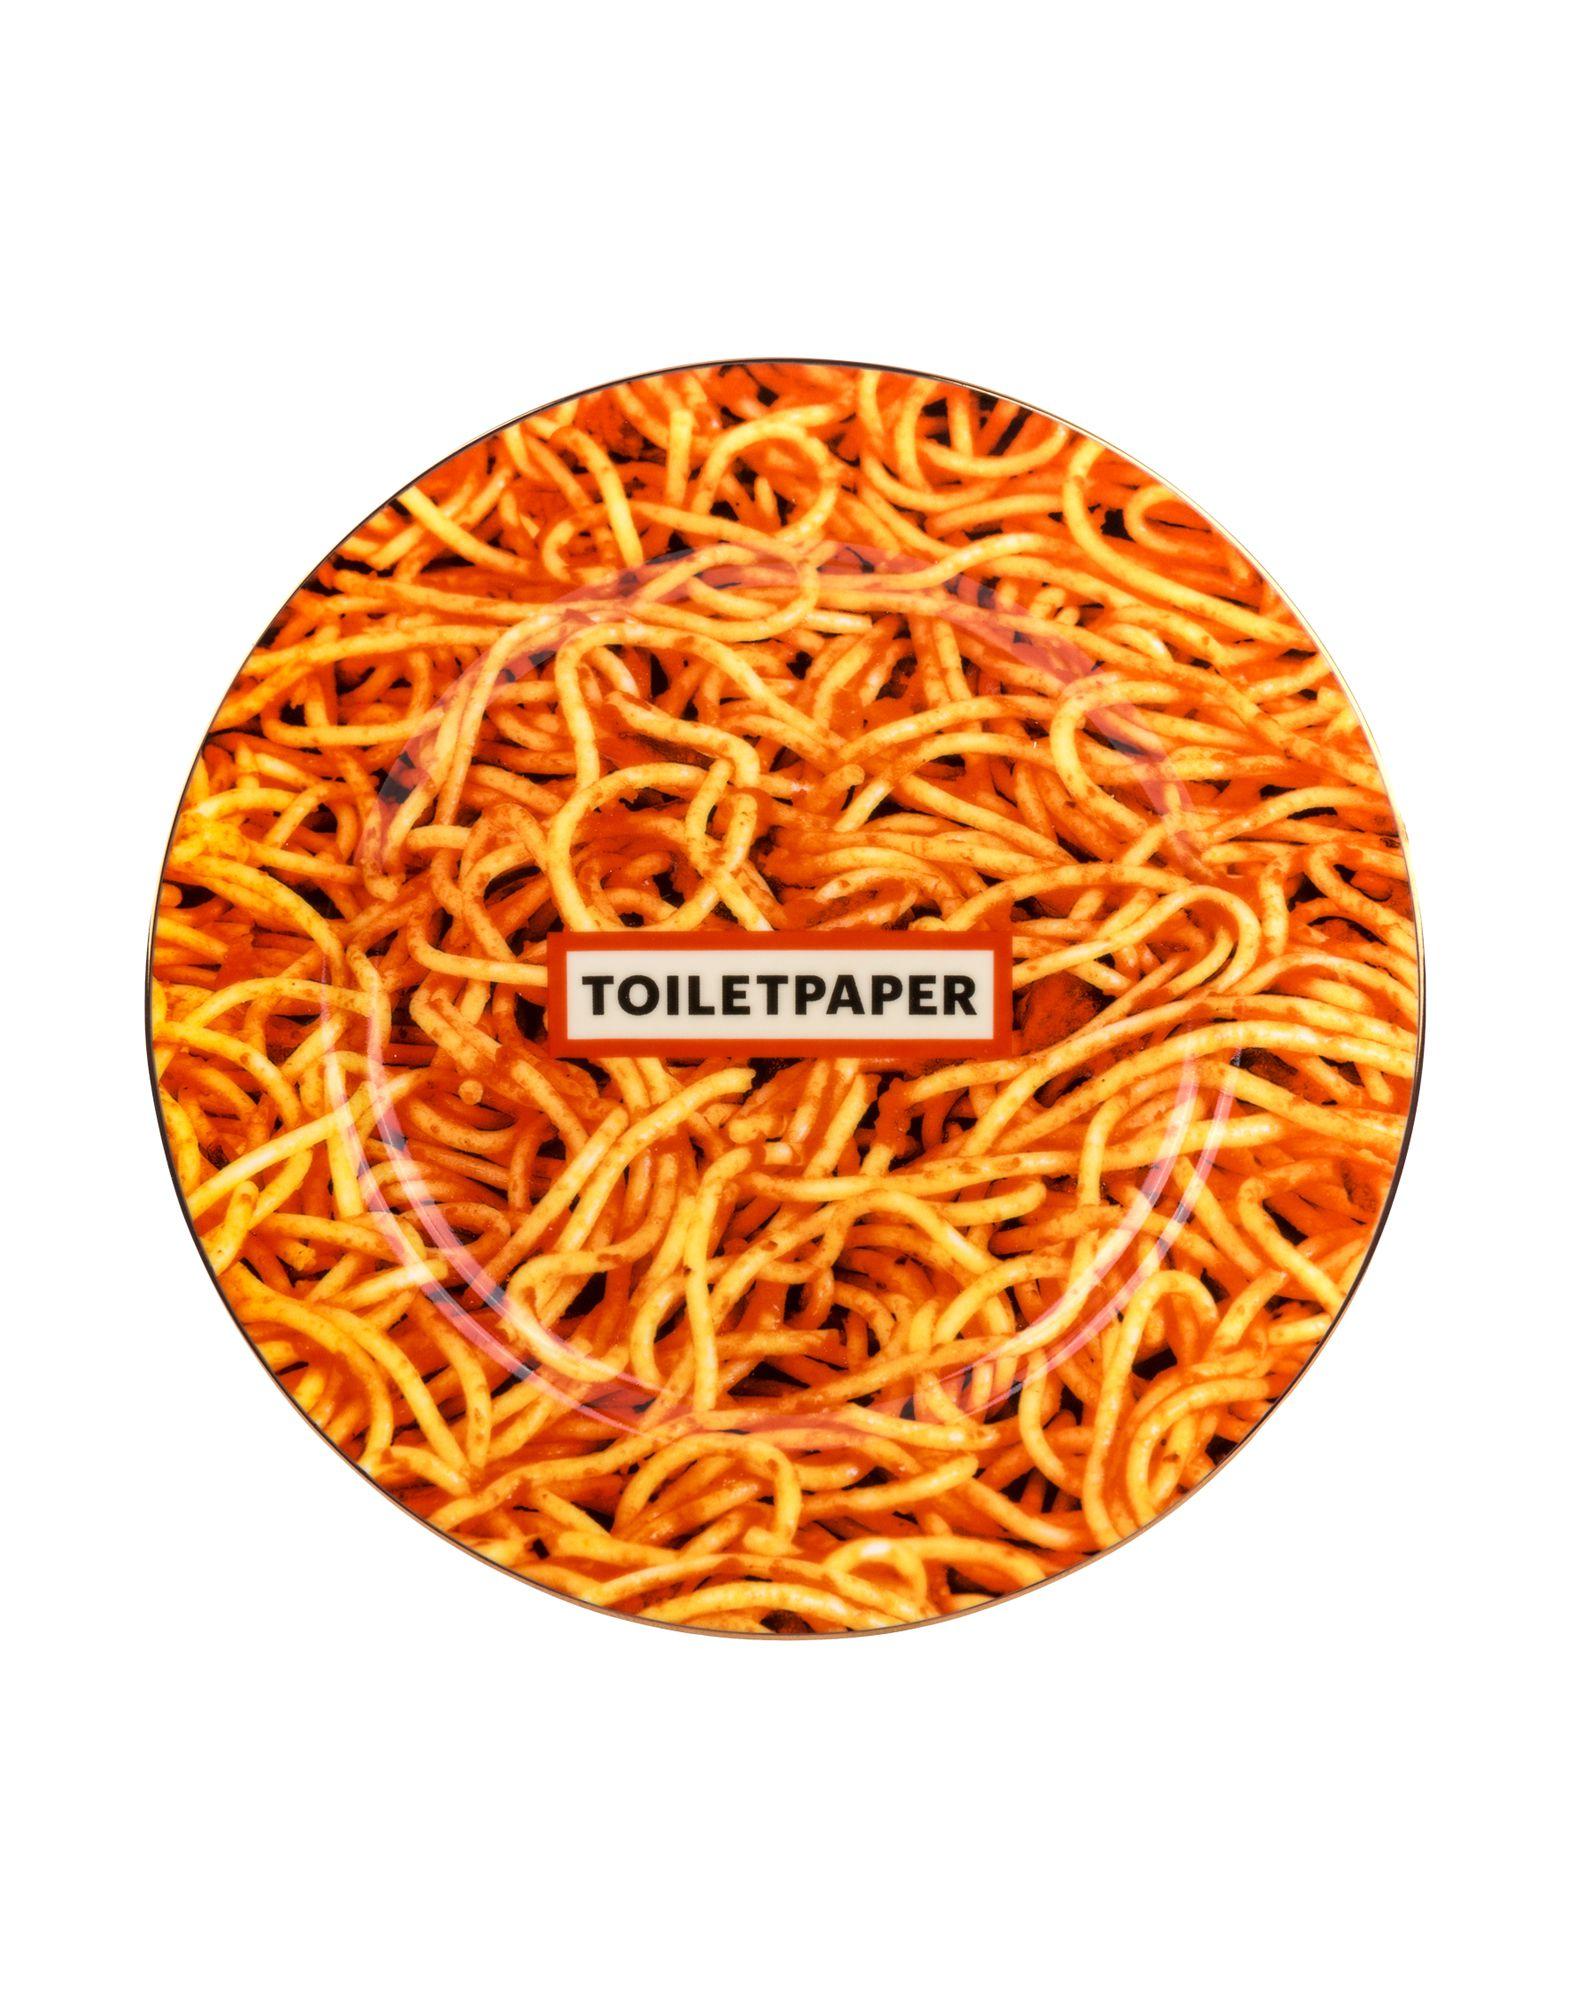 Seletti Wears Toiletpaper Spaghetti Plate Inredning